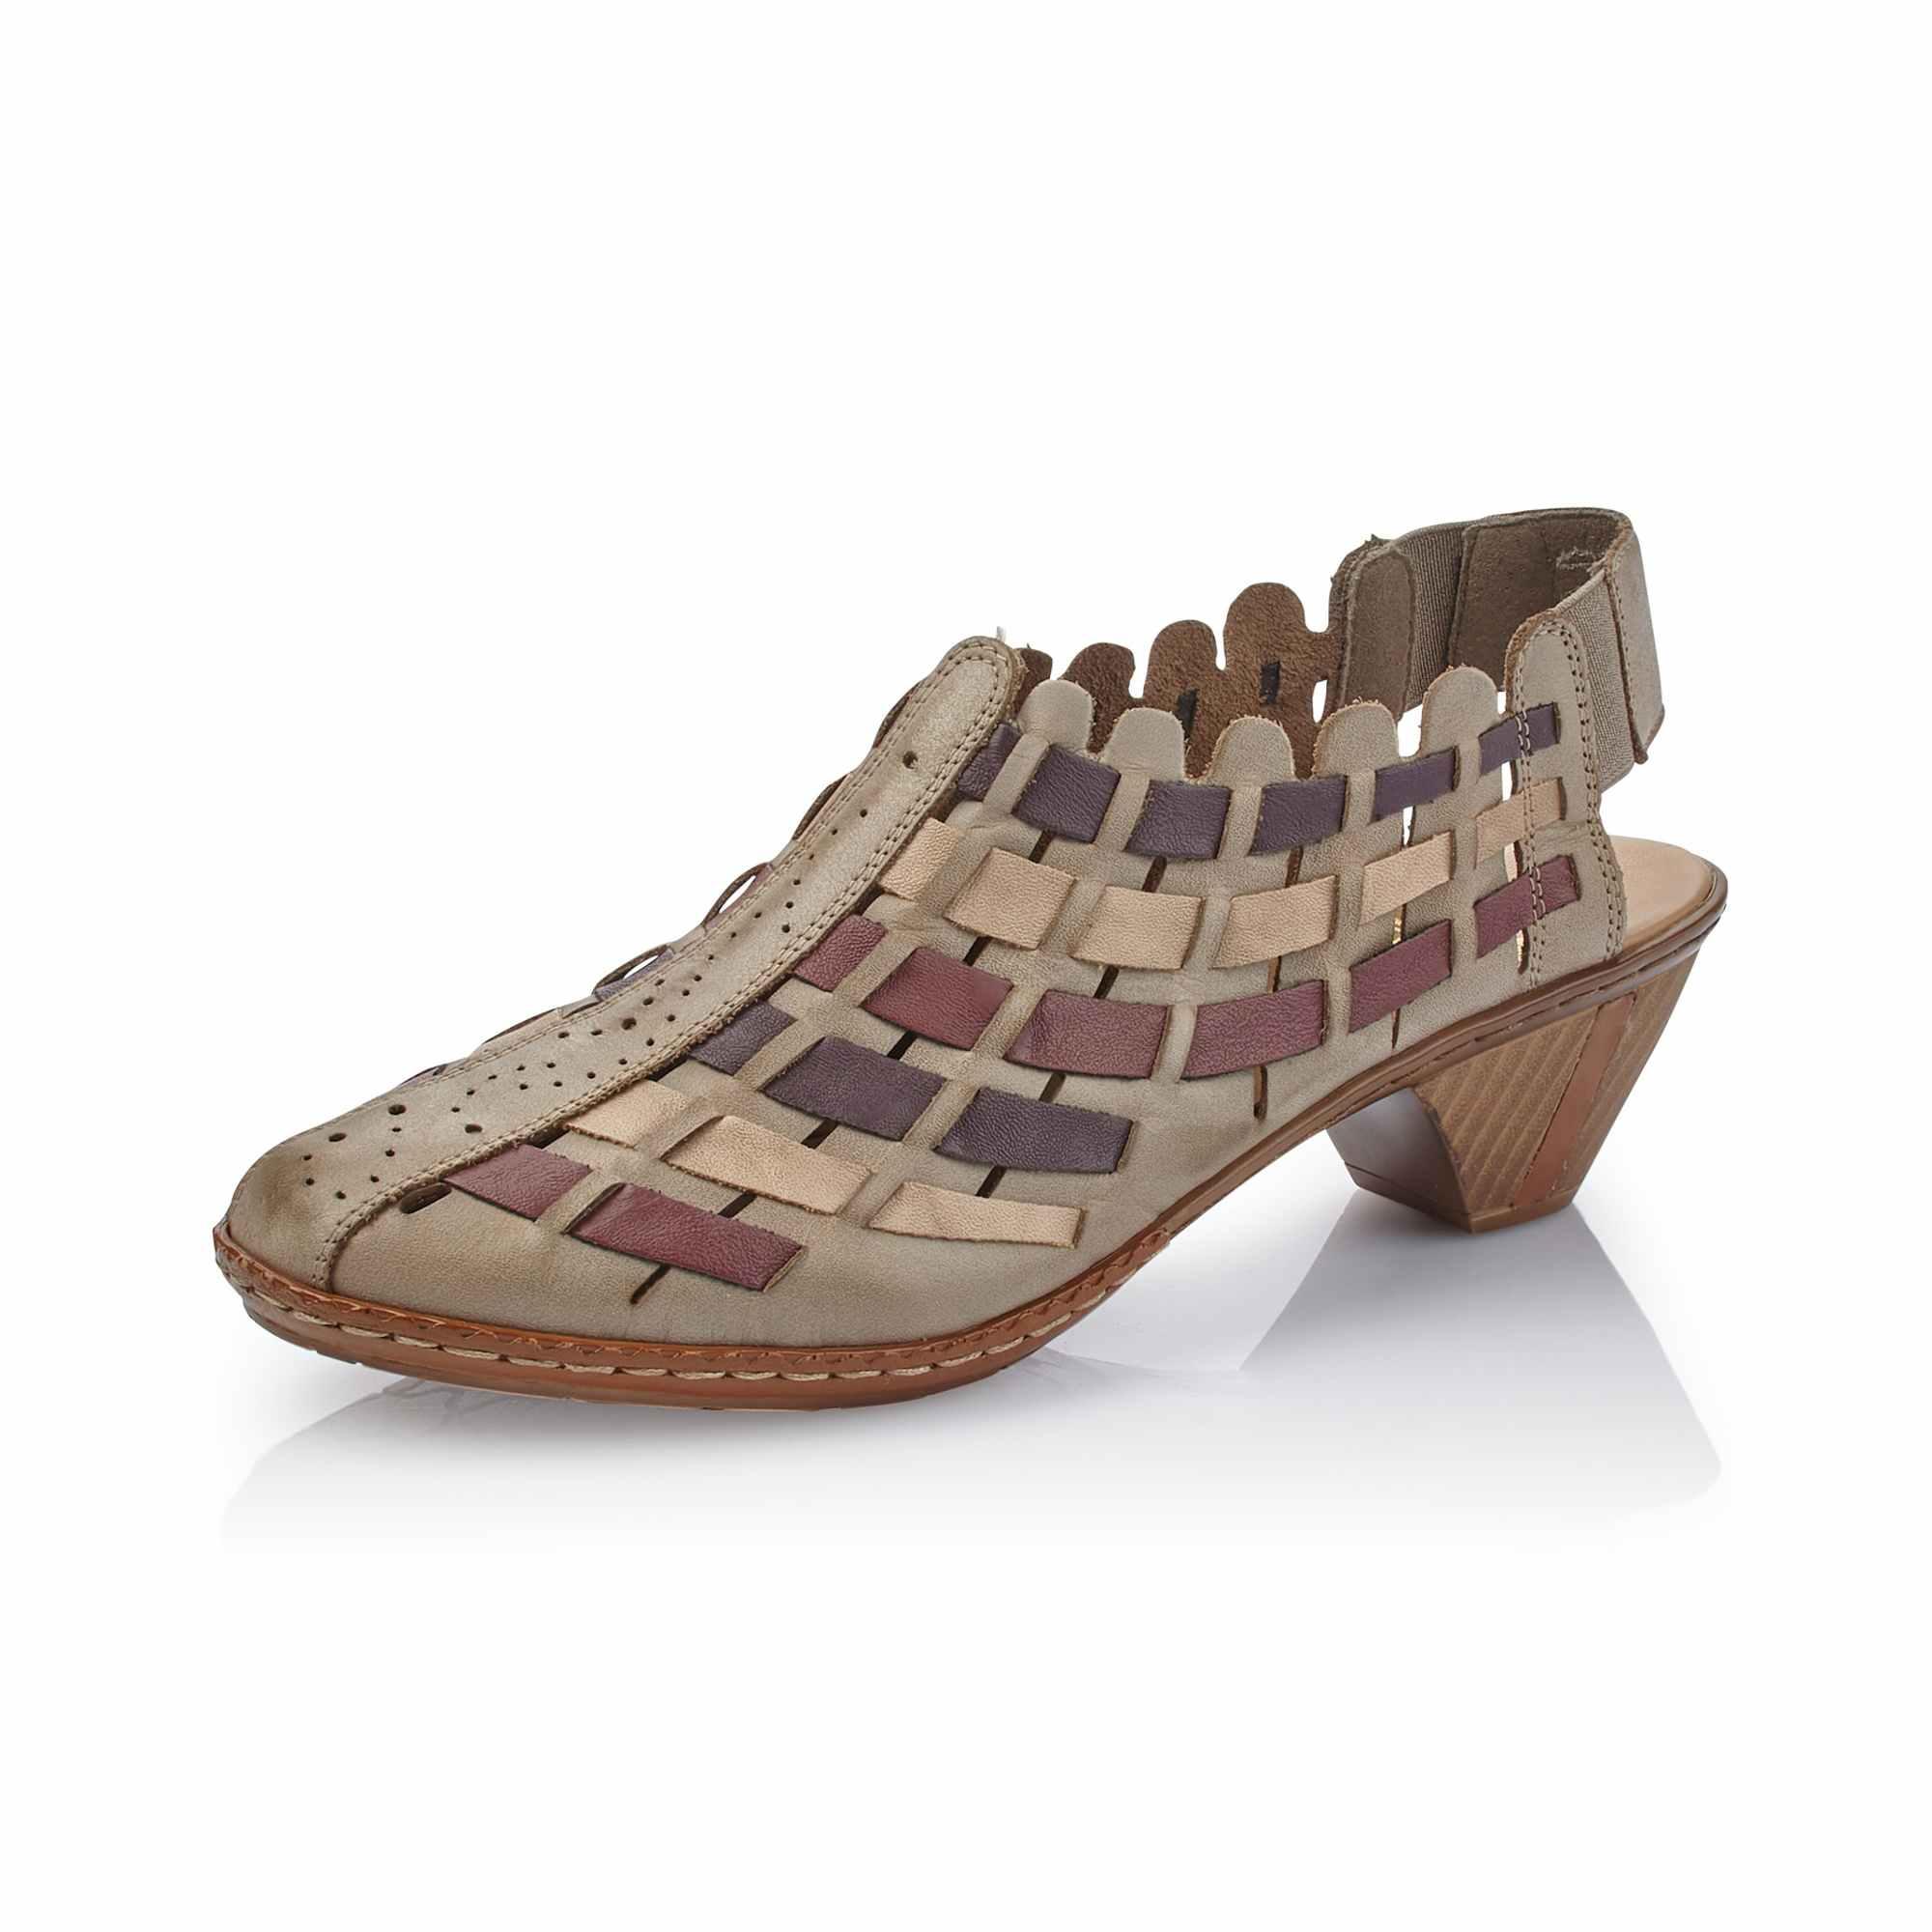 Dámská obuv RIEKER46778-62 BEIGE KOMBI F S 9  293aa2cc2ff